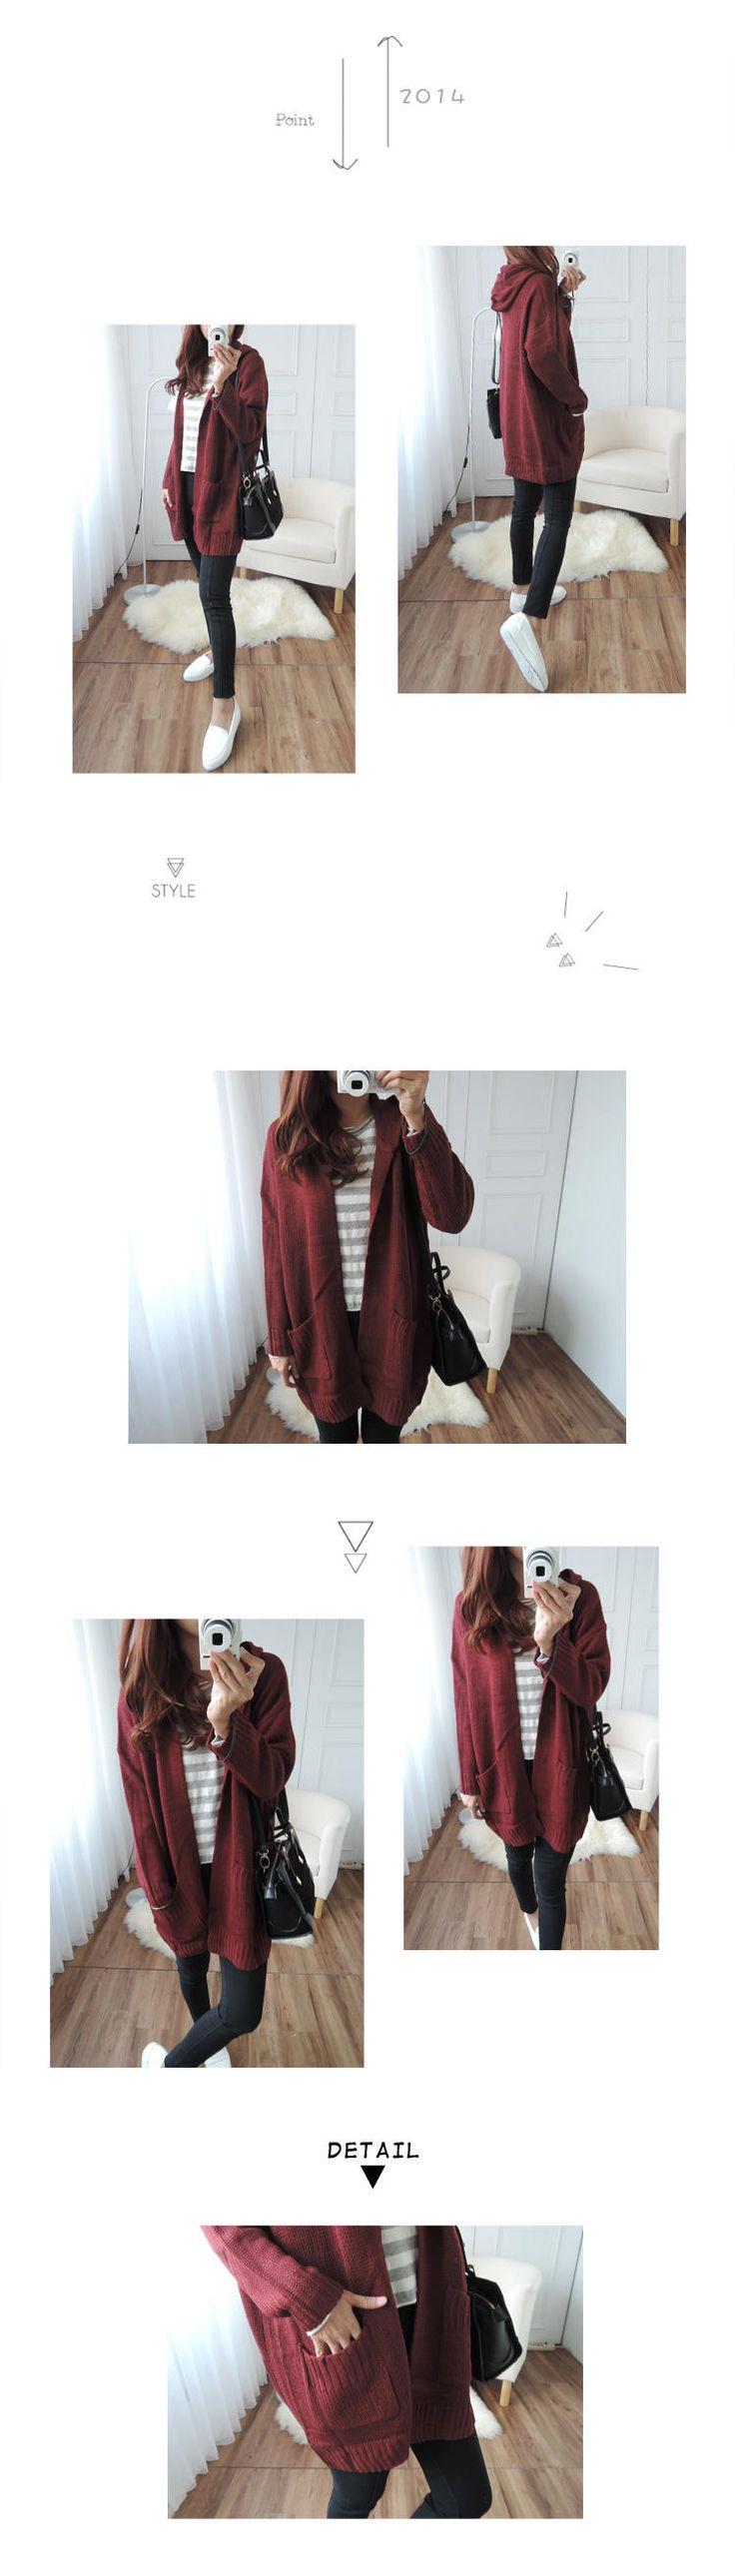 Long Hooded Cardigan, Dark Red , One Size - CYNTHIA | YESSTYLE Canada